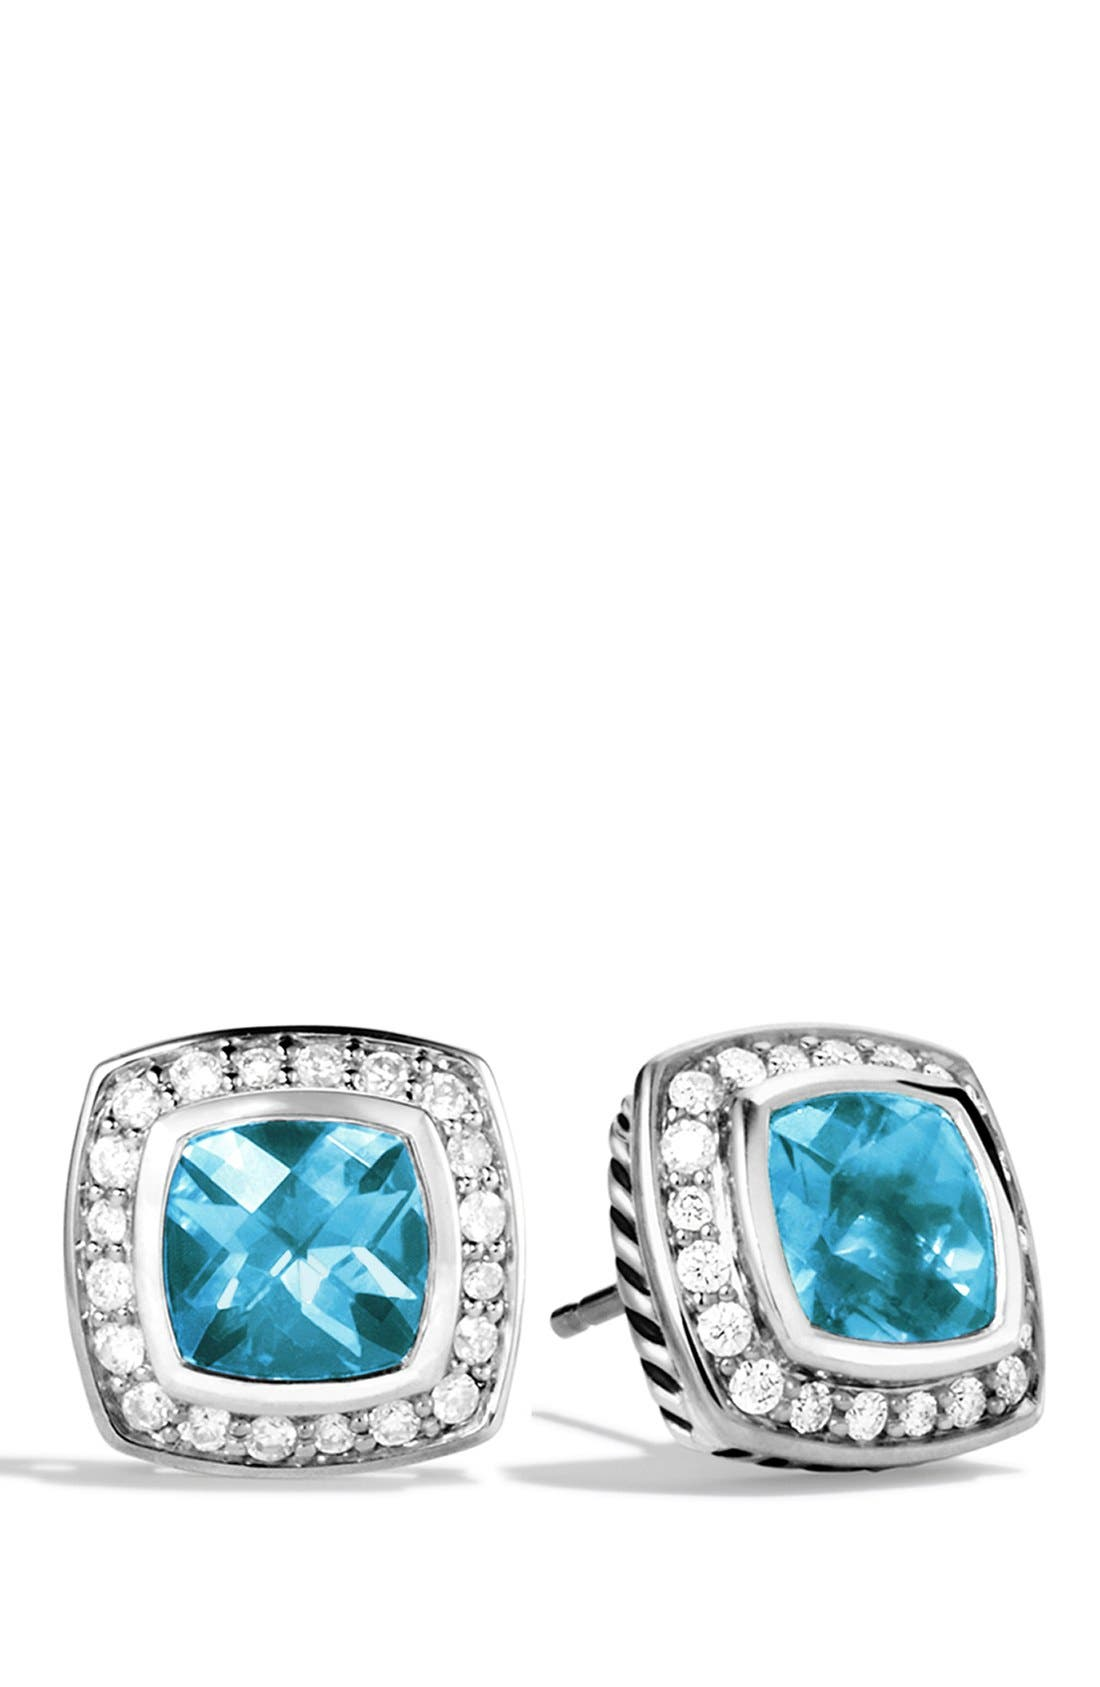 'Albion' Petite Earrings with Semiprecious Stones & Diamonds,                             Main thumbnail 4, color,